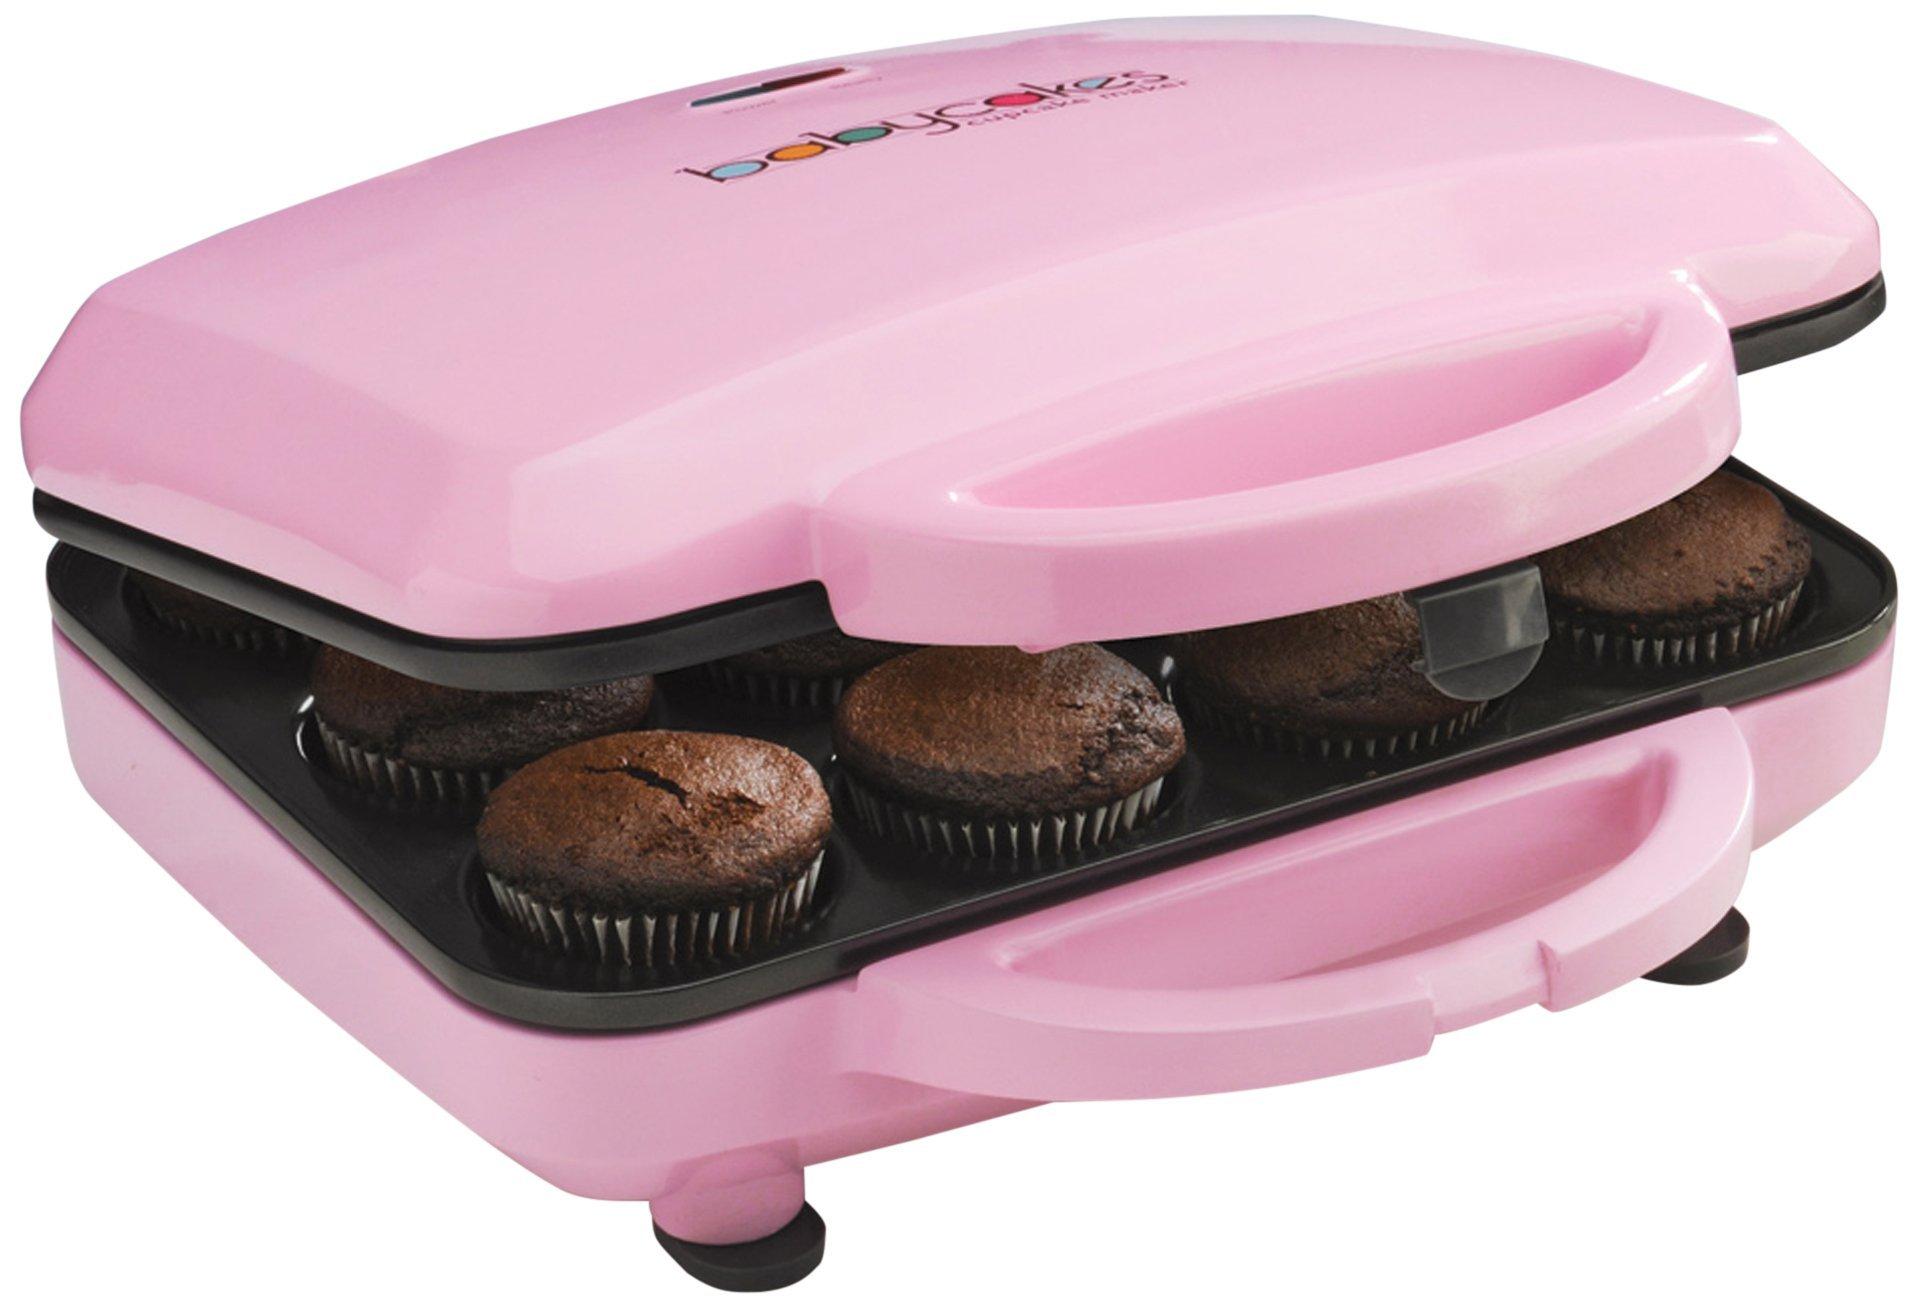 Babycakes CC-12 Full Size Cupcake Maker, Pink by Babycakes